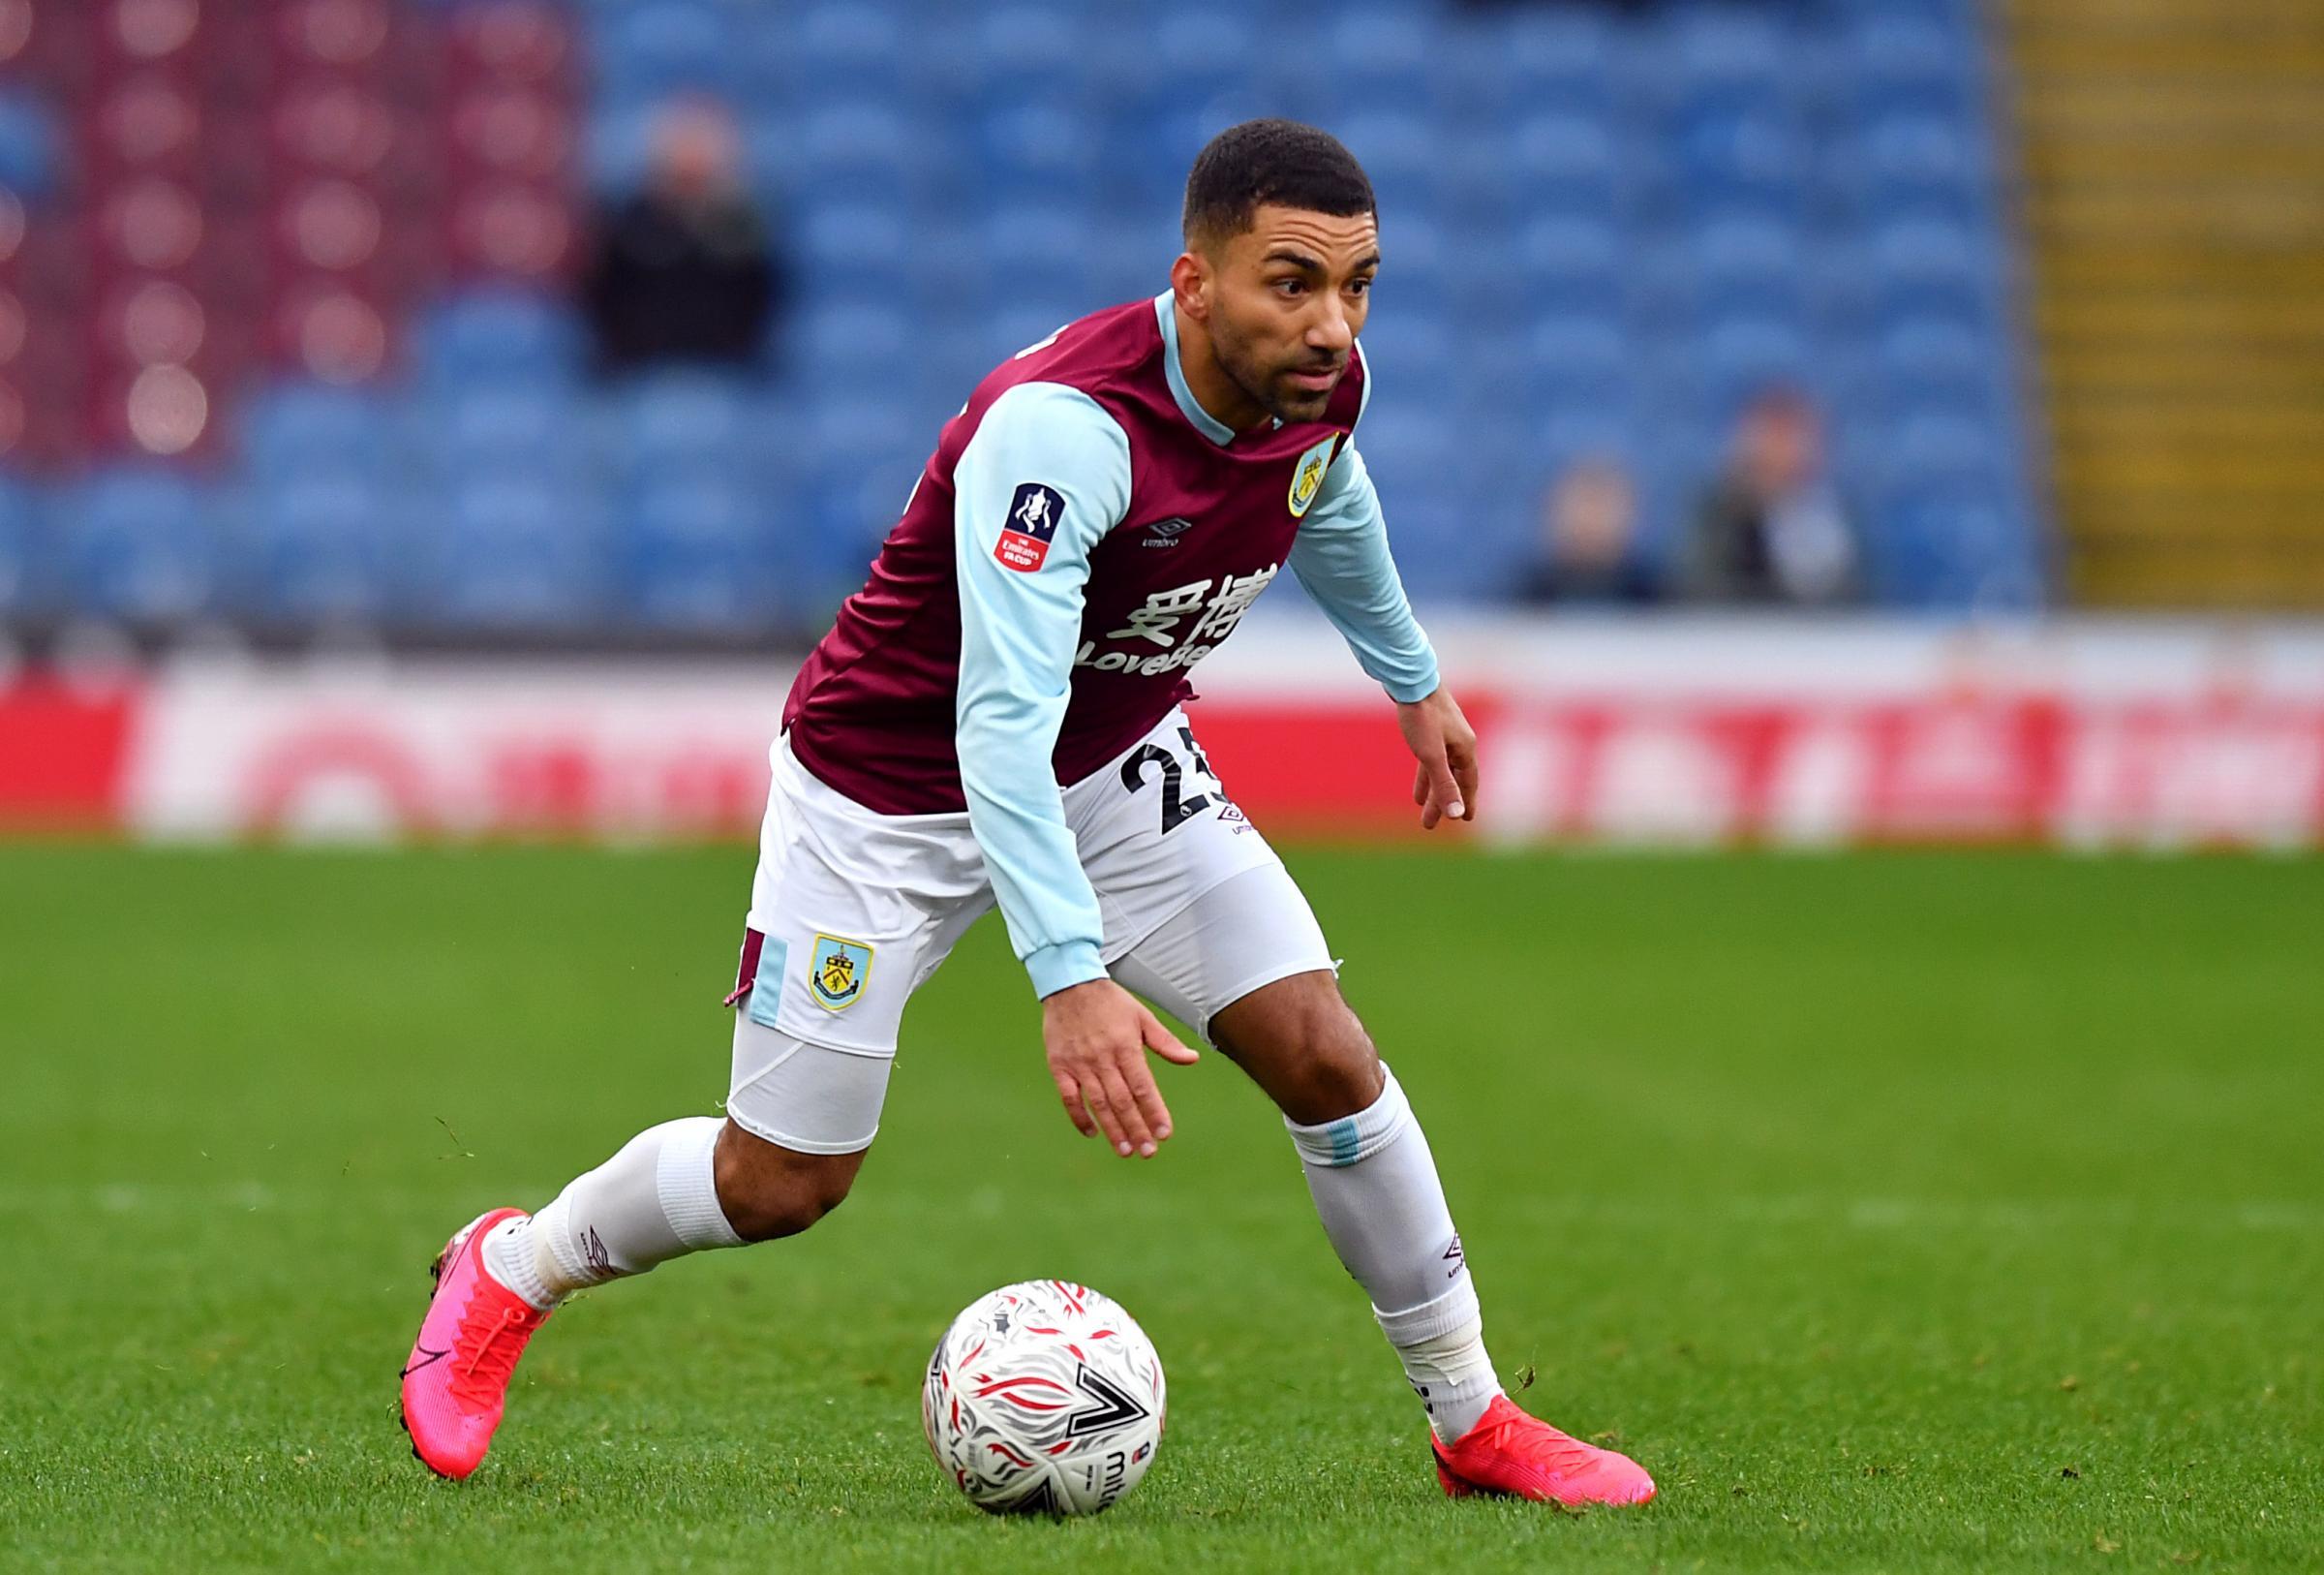 Burnley boss Sean Dyche on Aaron Lennon's potential return